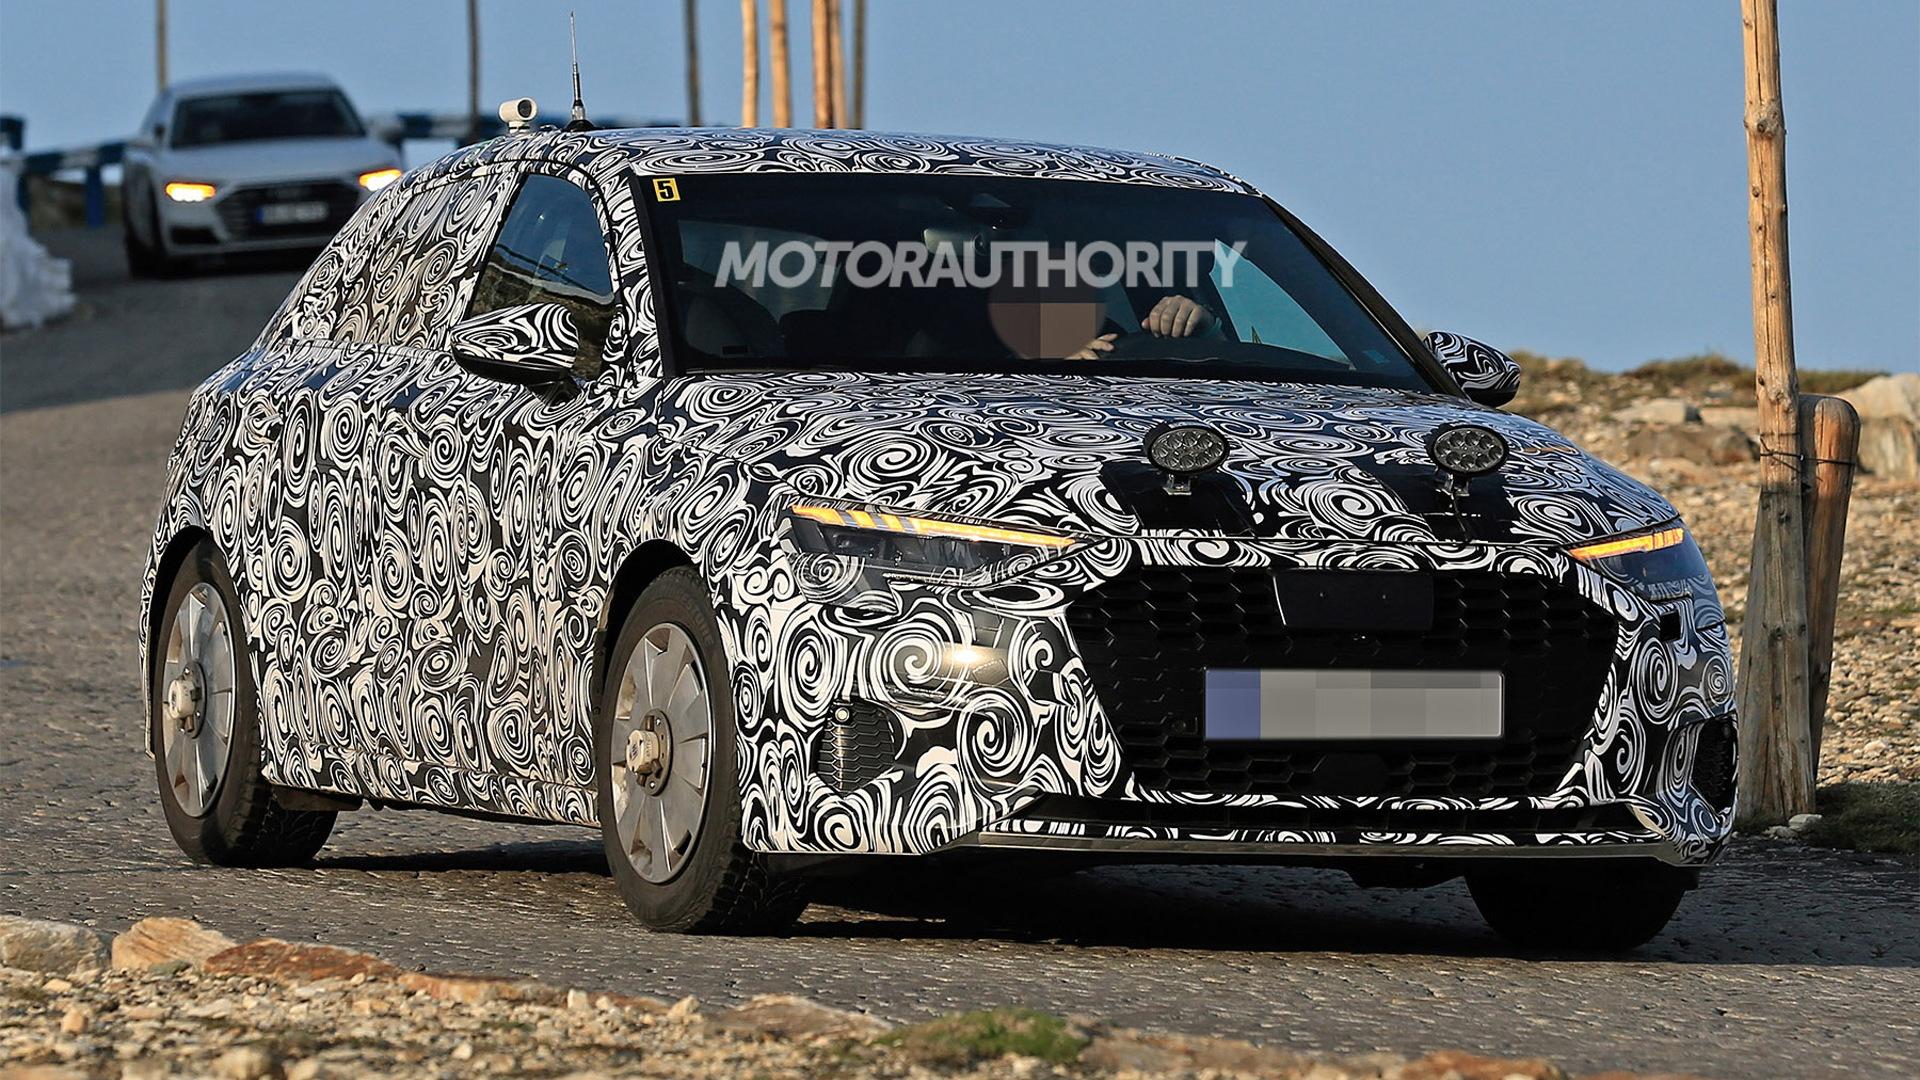 2021 Audi A3 Sportback spy shots - Image via S. Baldauf/SB-Medien